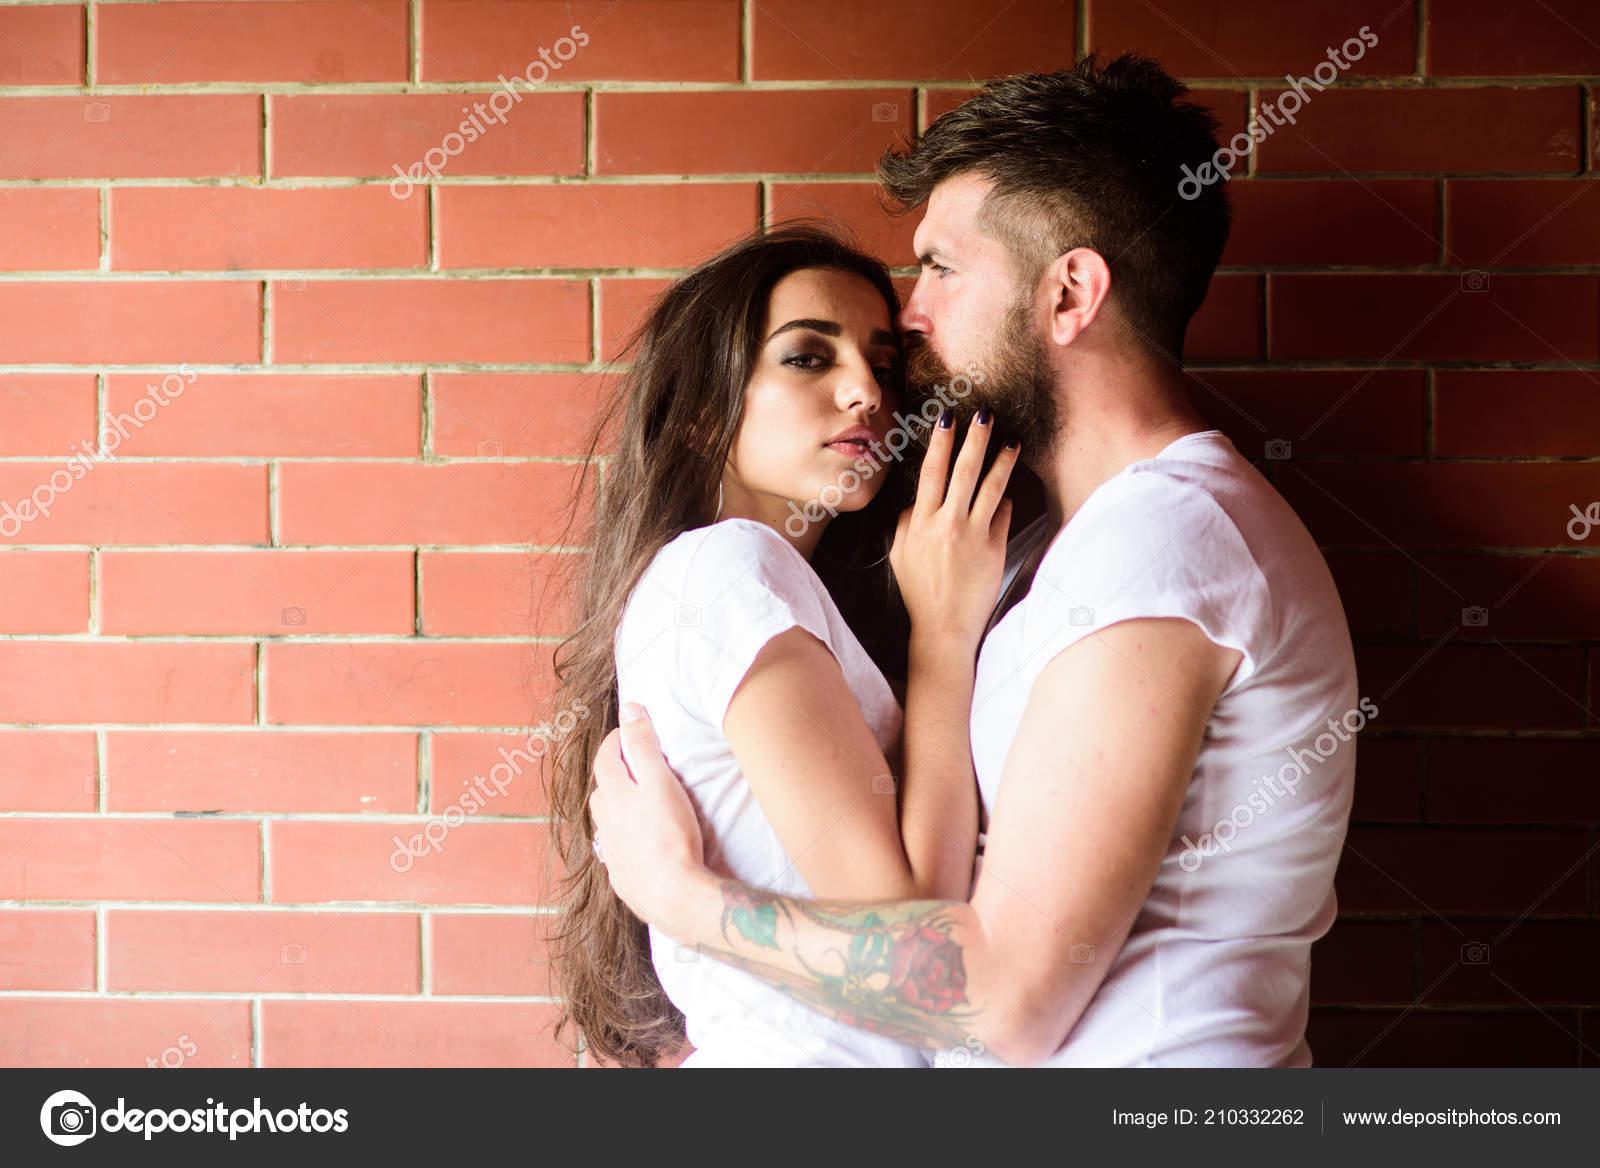 40 Tage Dating heute zeigen